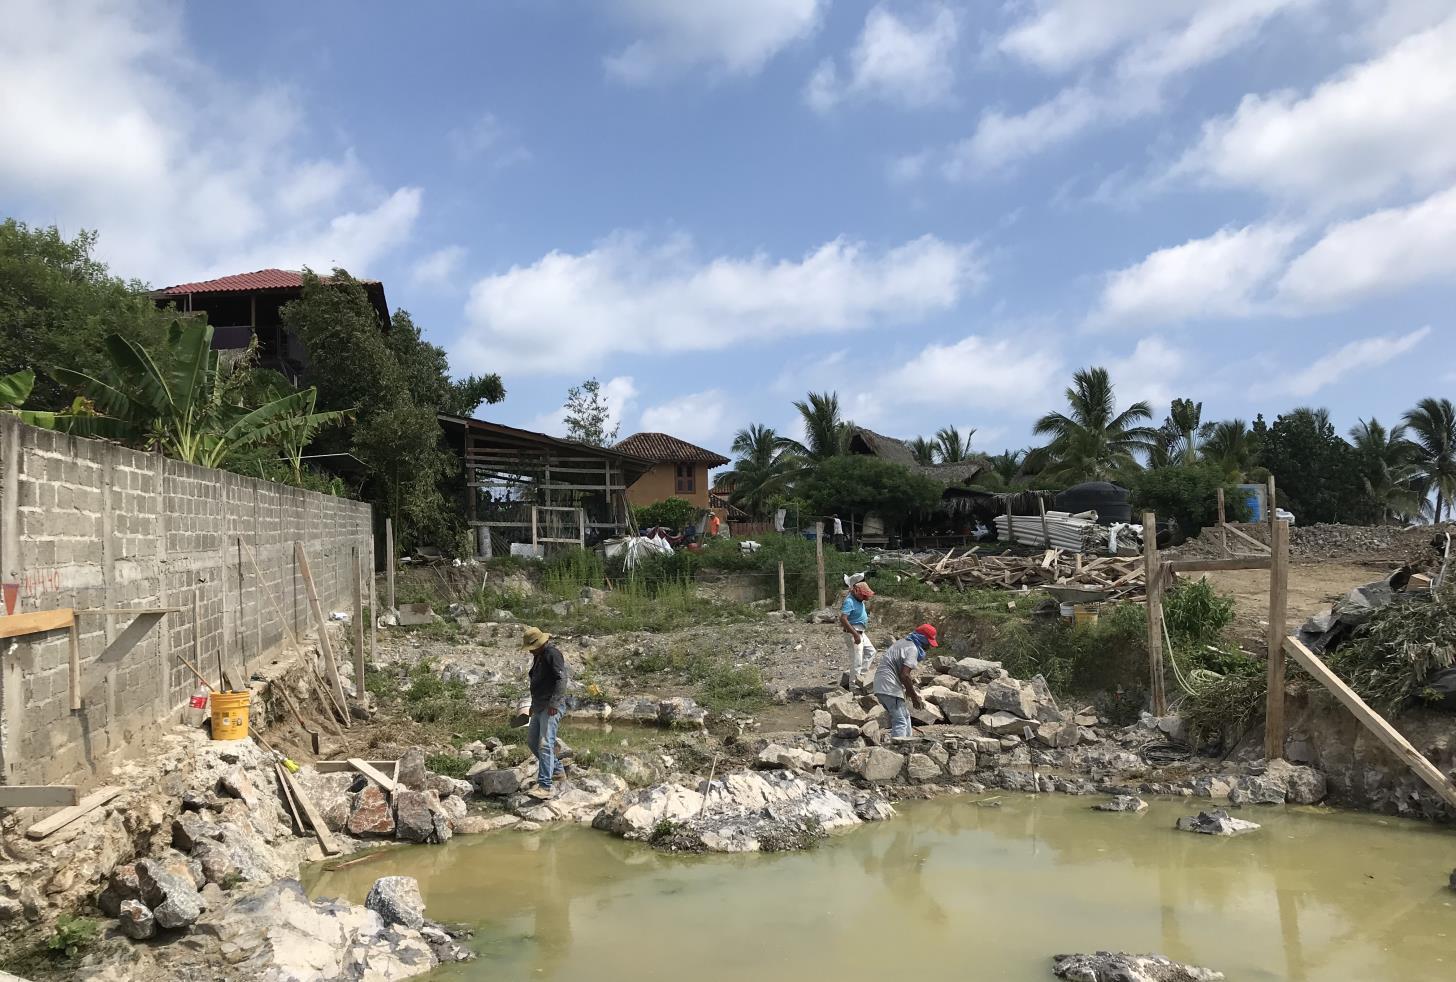 REPORTE-FOTOGRAFICO-PUNTA-MAJAHUA-12-DE-AGOSTO-DEL-2018-035.jpg